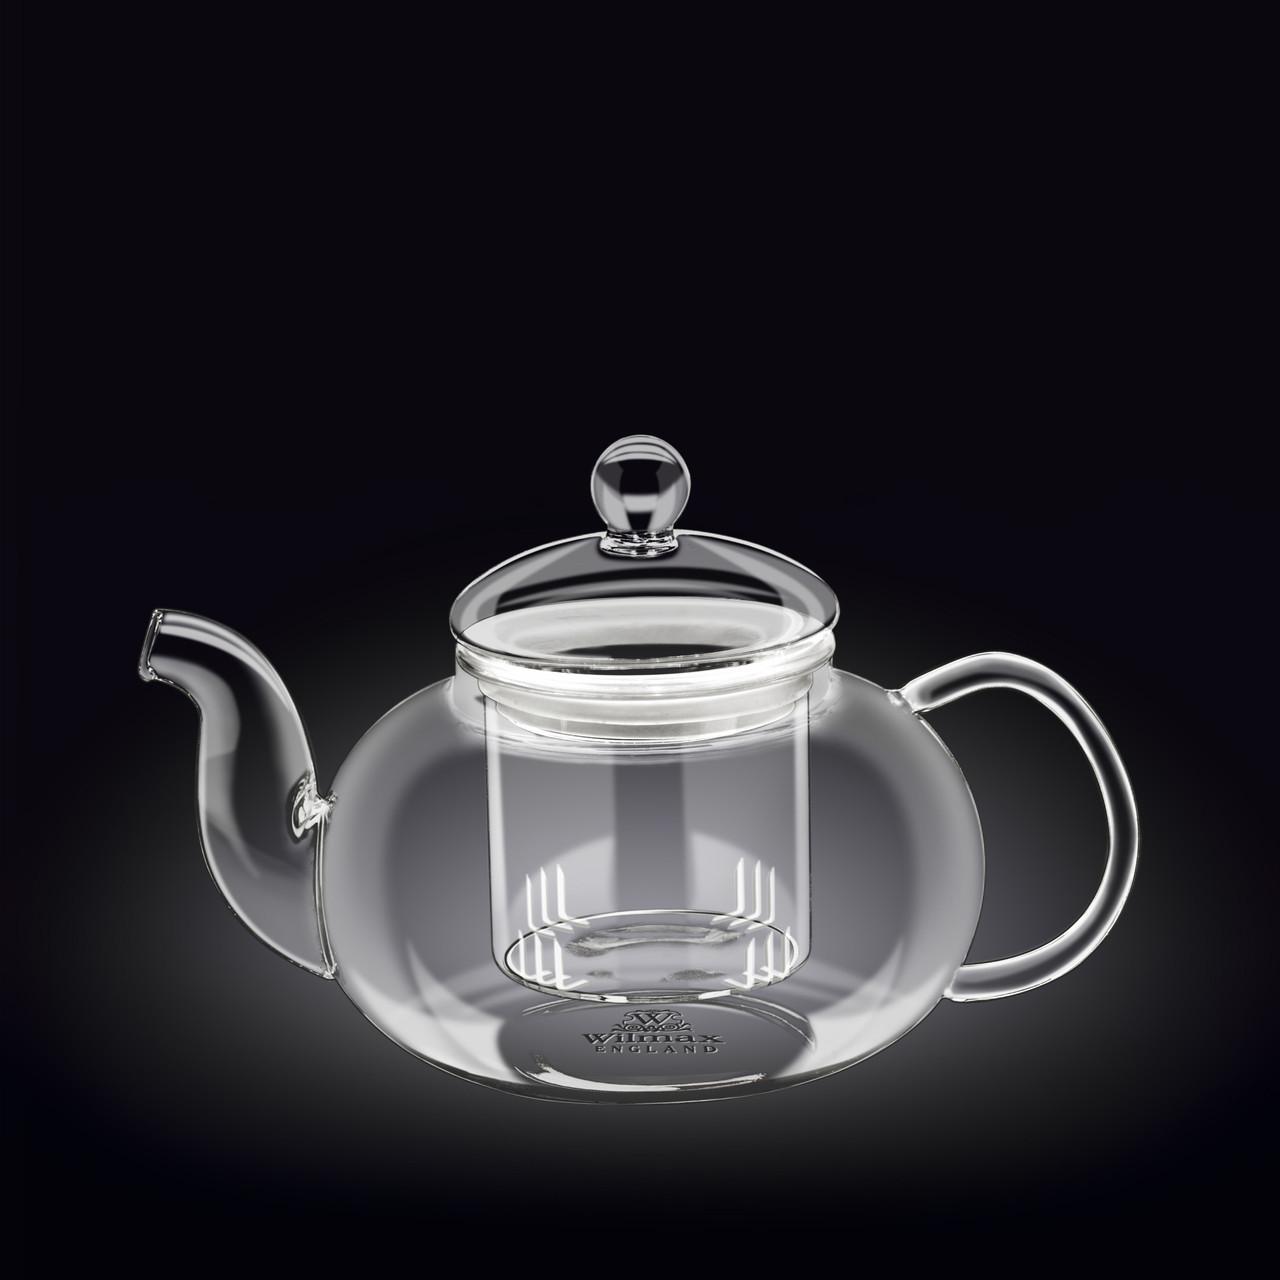 Чайник стеклянный 1200 мл Wilmax WL-888815